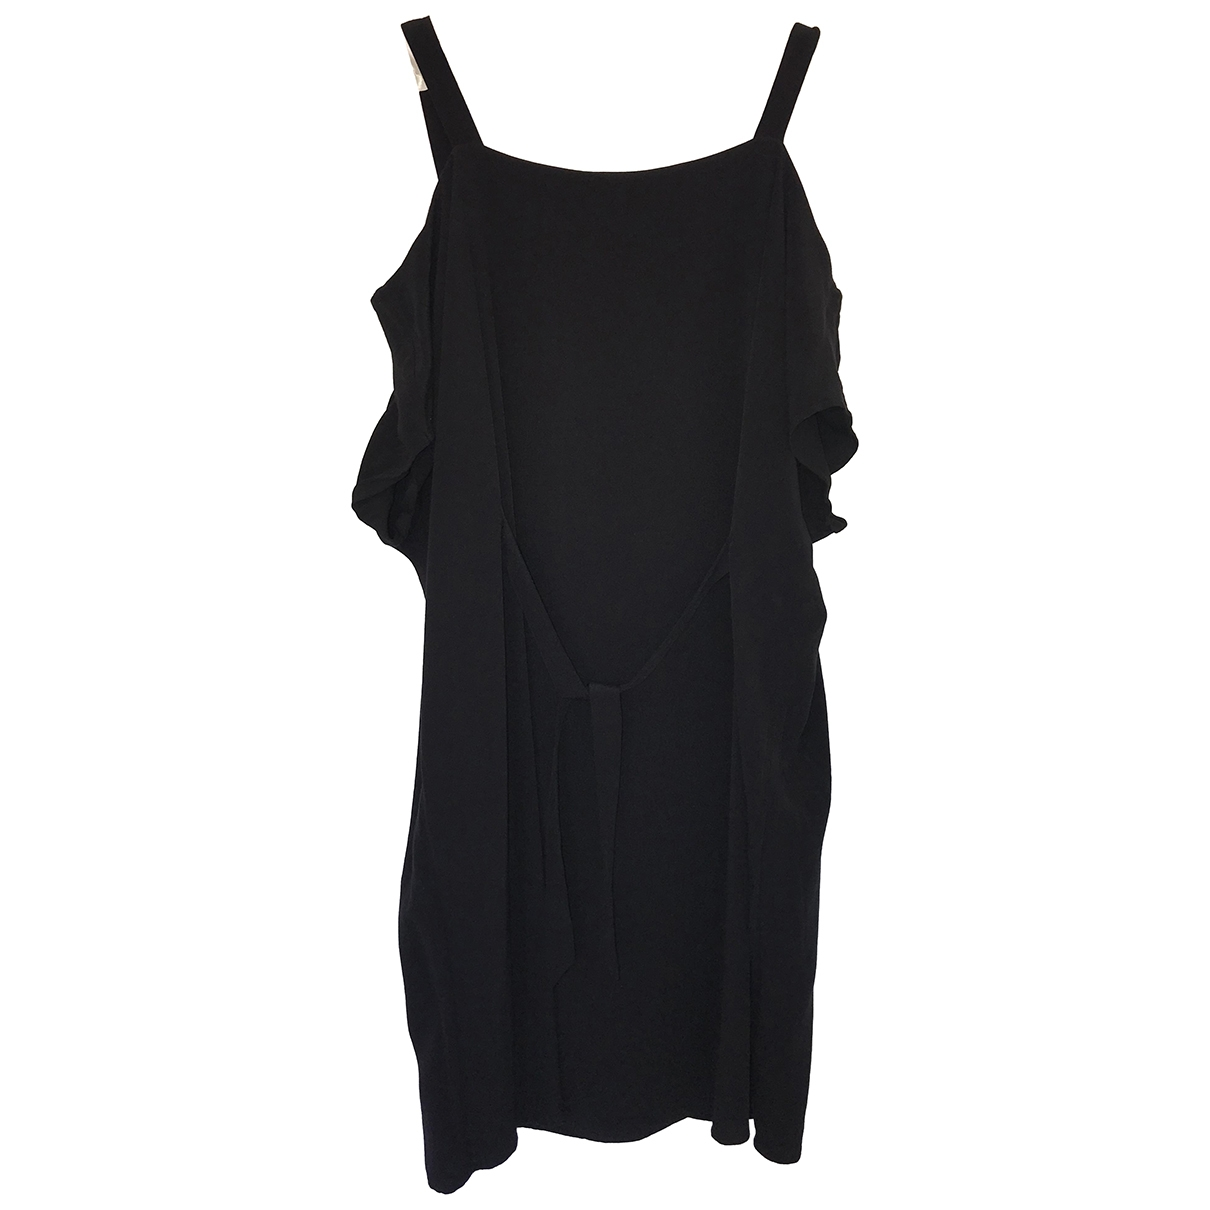 All Saints \N Black Cotton dress for Women 16 UK